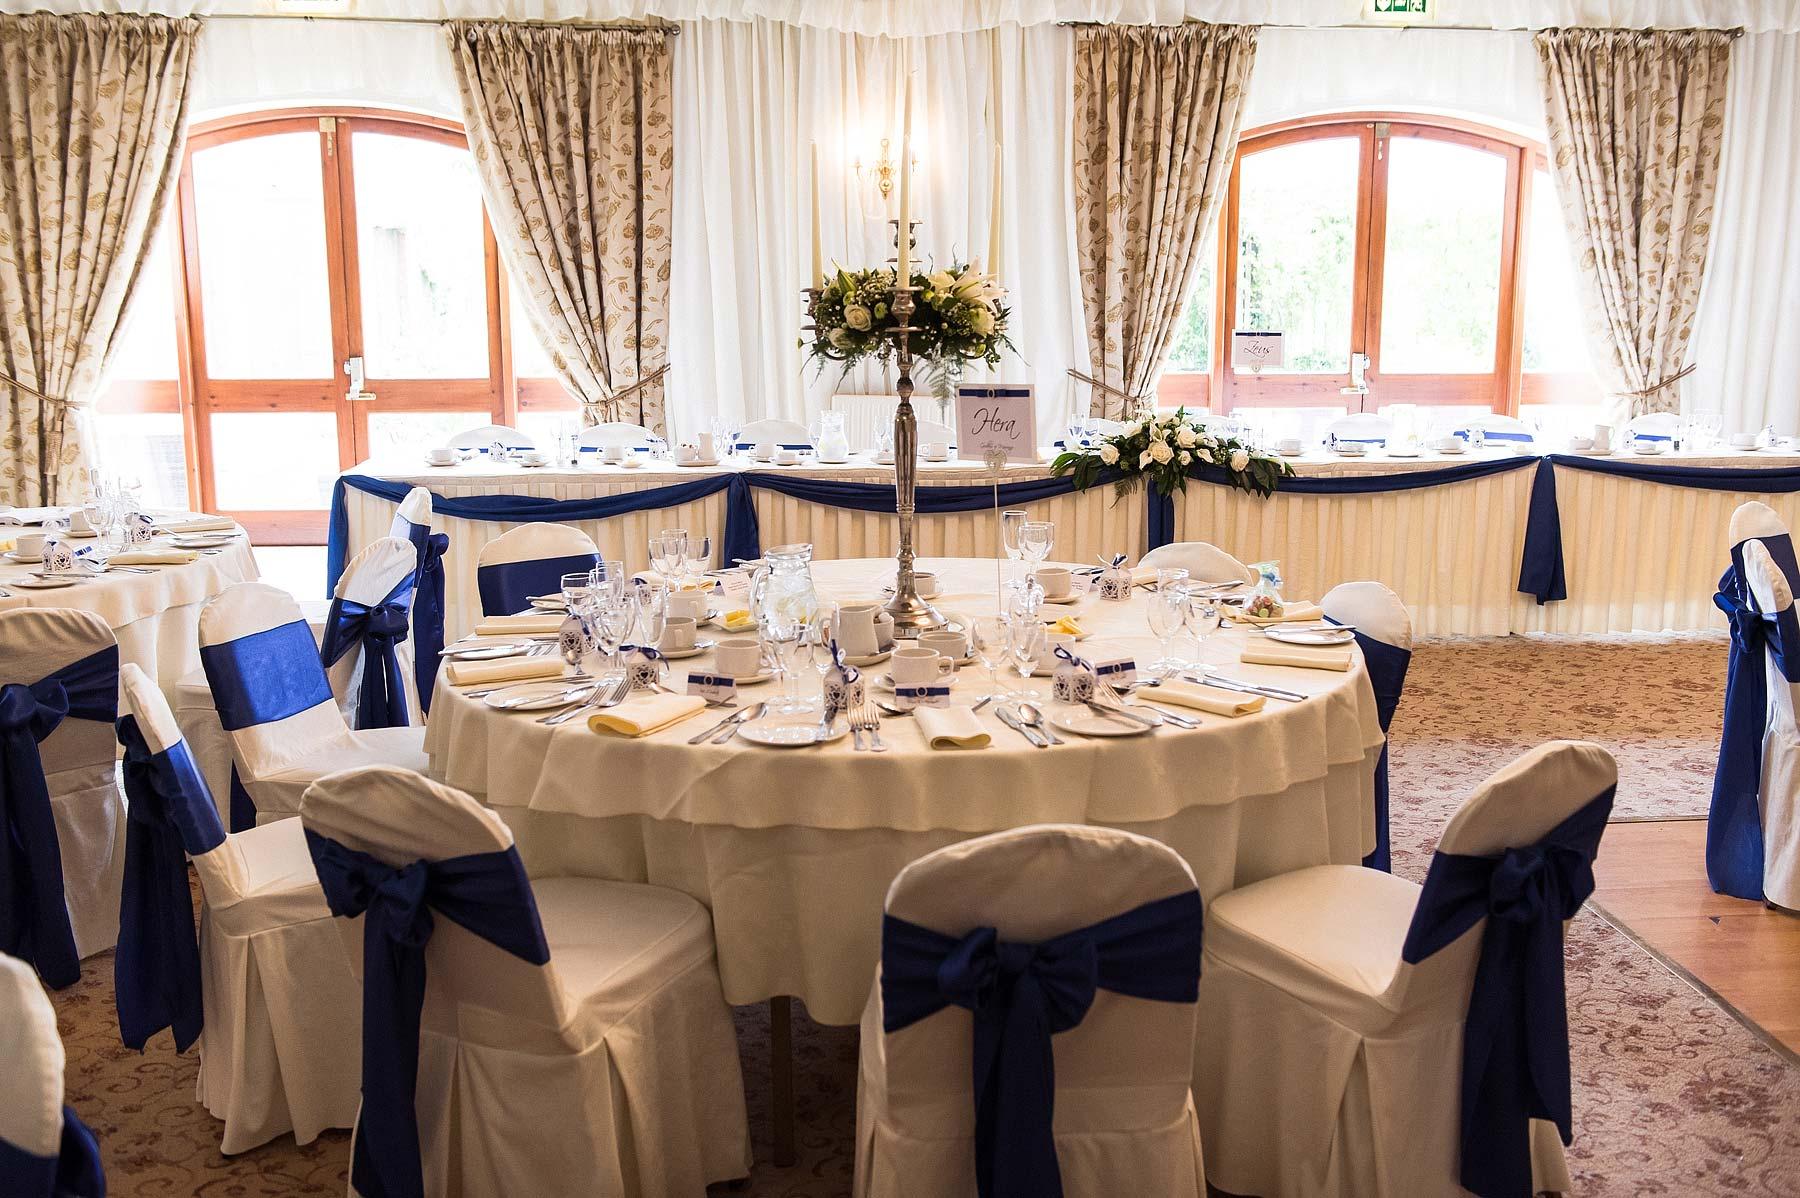 albright-hussey-manor-wedding-photographers-057